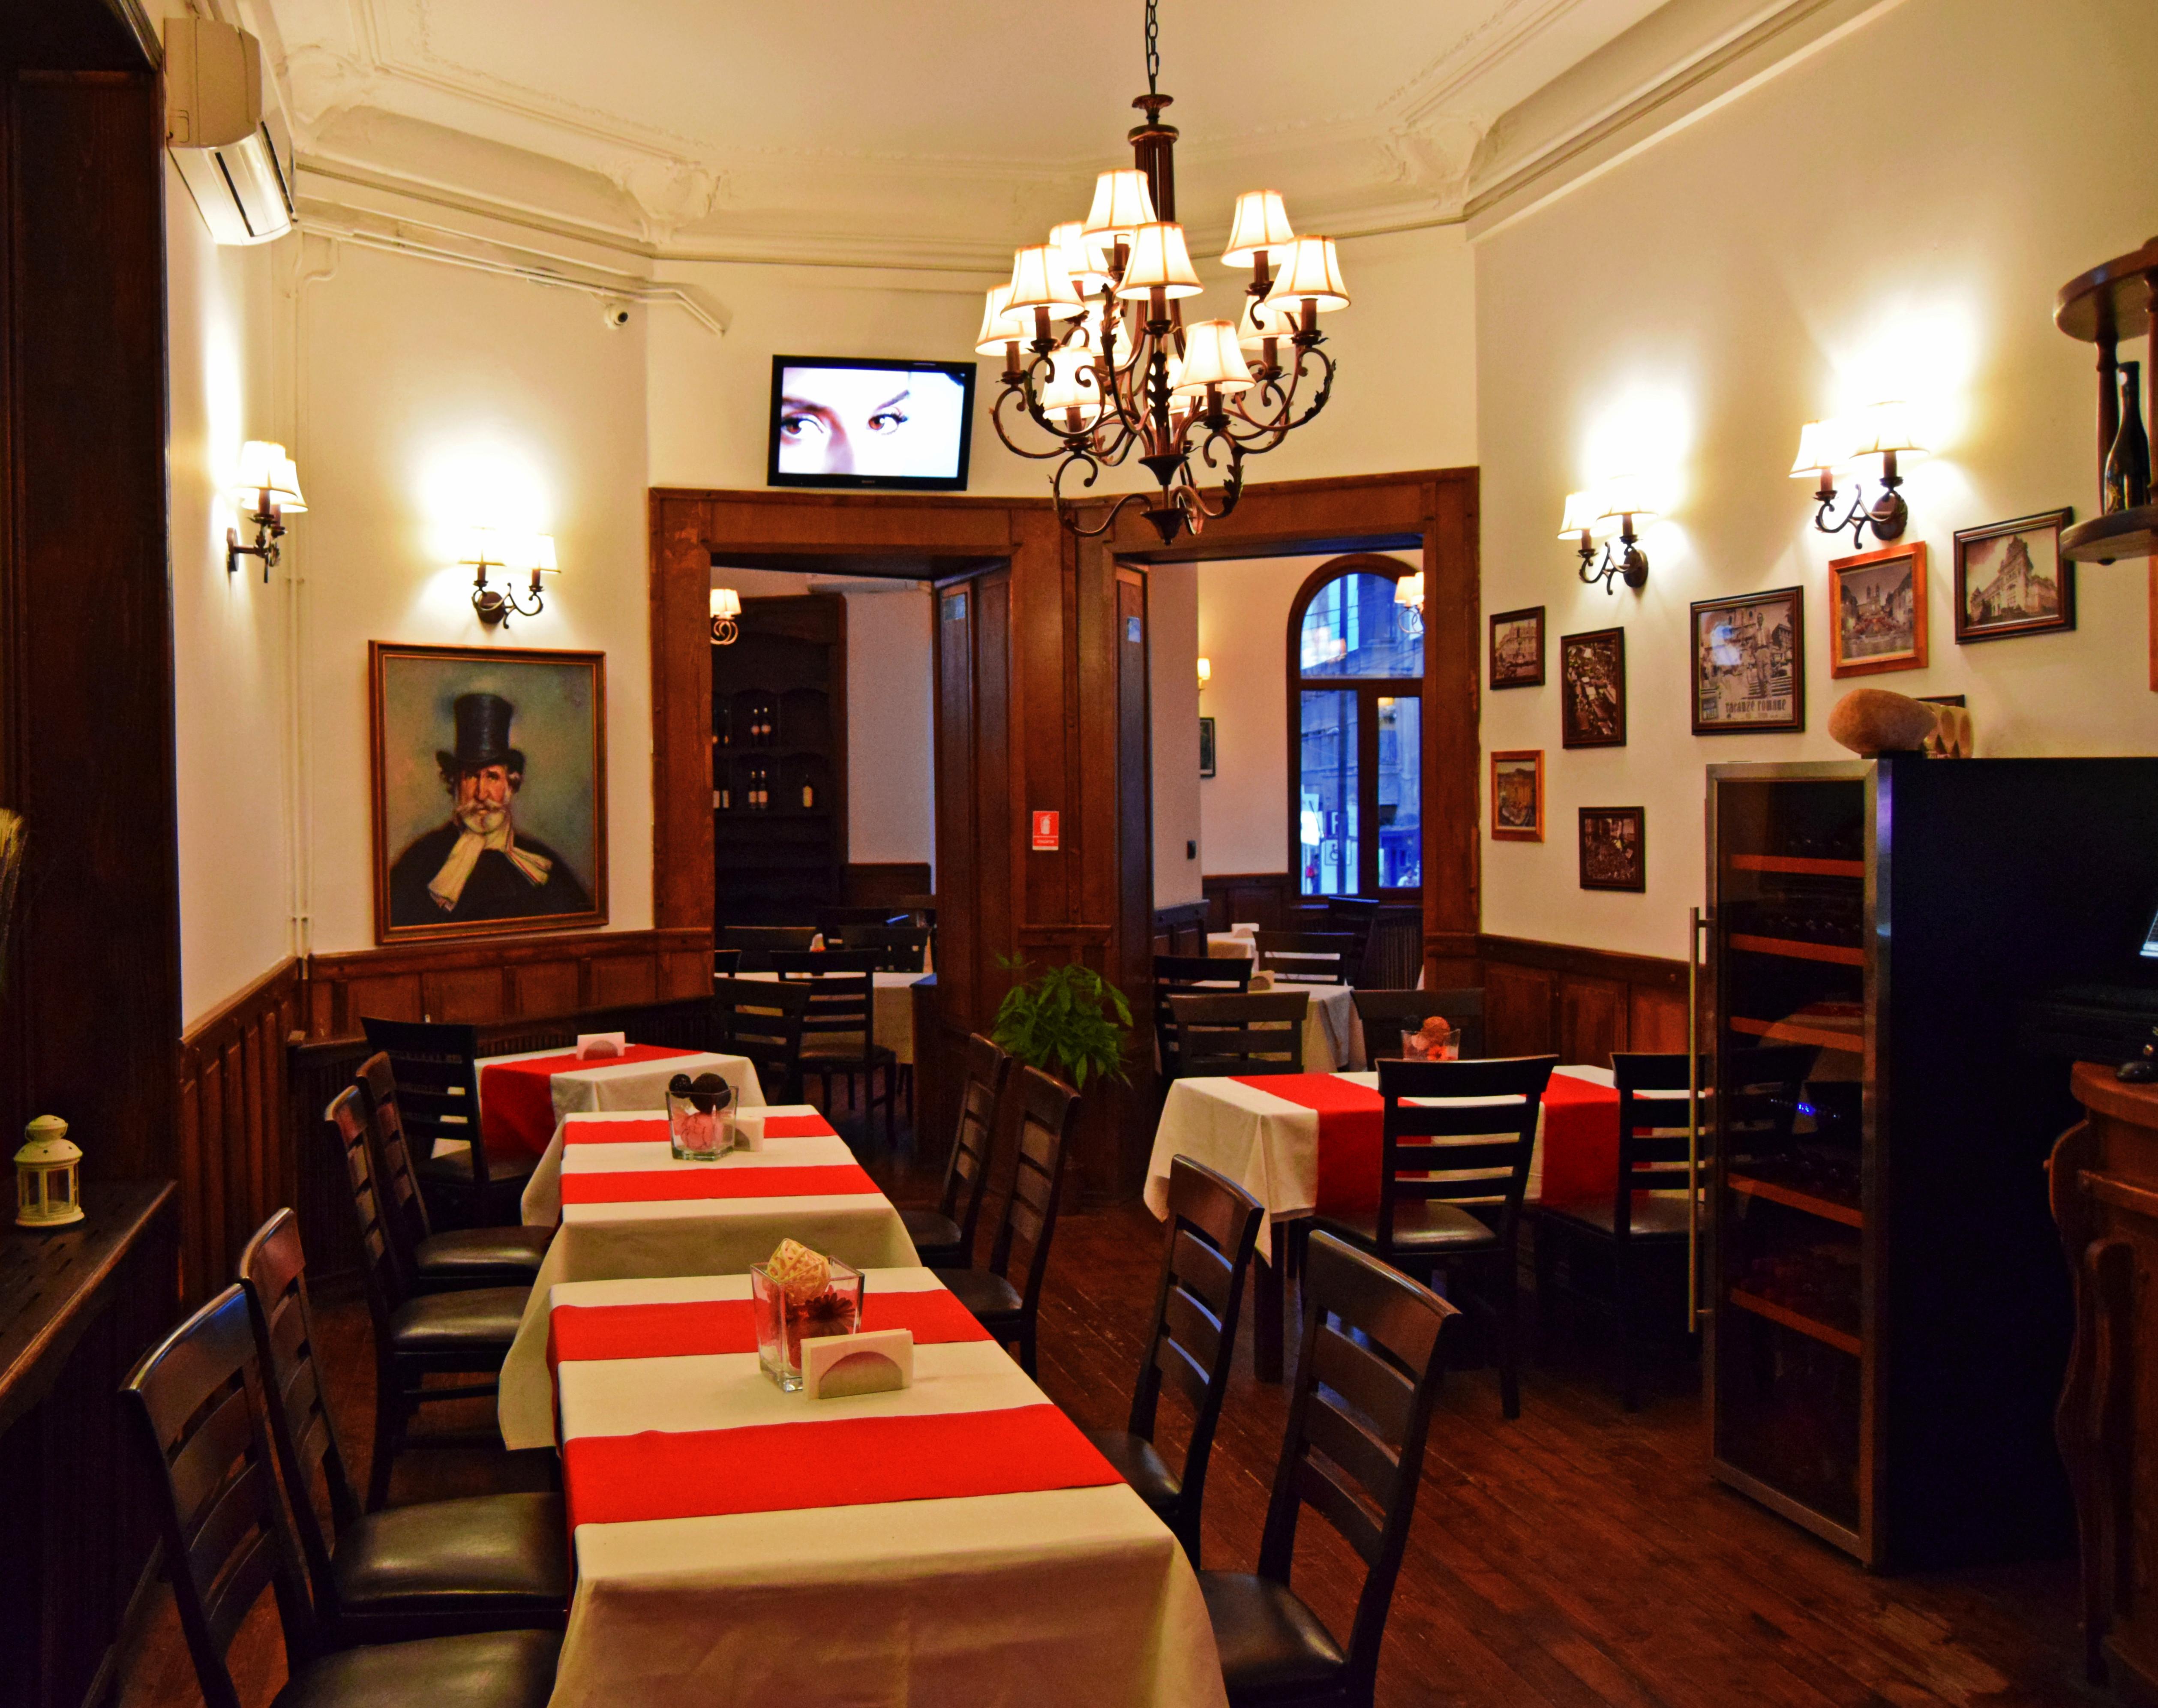 zu verkaufen bar restaurant nachtclub bucuresti bukarest rumanien str tache ionescu 29. Black Bedroom Furniture Sets. Home Design Ideas